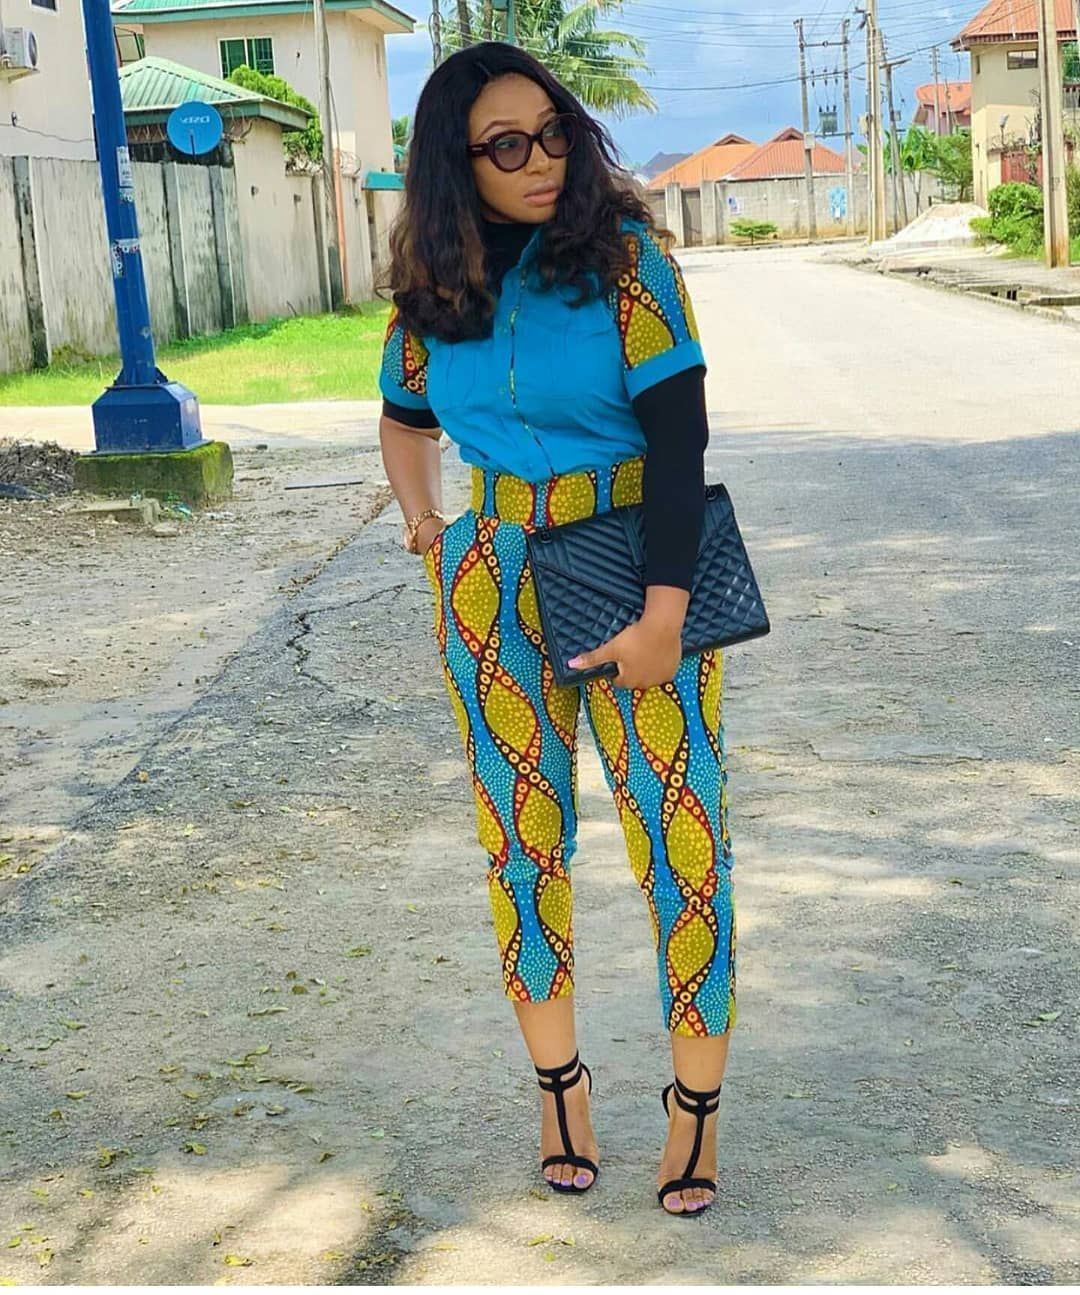 #amw_fashion #owanbe #ankara #nigeriawedding #africanprint #ghana #asobi #9ja #asoebistyle #fashionstyle #fashions #celebrity #kente #lagos #collection #yoruba #infographic #nollywood  #asoebibella #asoebibellanaija #asoebistyles #asookevendor #lagoswomen #lagosweddings #ankara #ankaradresses #ankarafashion #ankaraskirt #ankaraaccessories #ankarastil #amw_fashion #owanbe #ankara #nigeriawedding #africanprint #ghana #asobi #9ja #asoebistyle #fashionstyle #fashions #celebrity #kente #lagos #collec #ankarastil